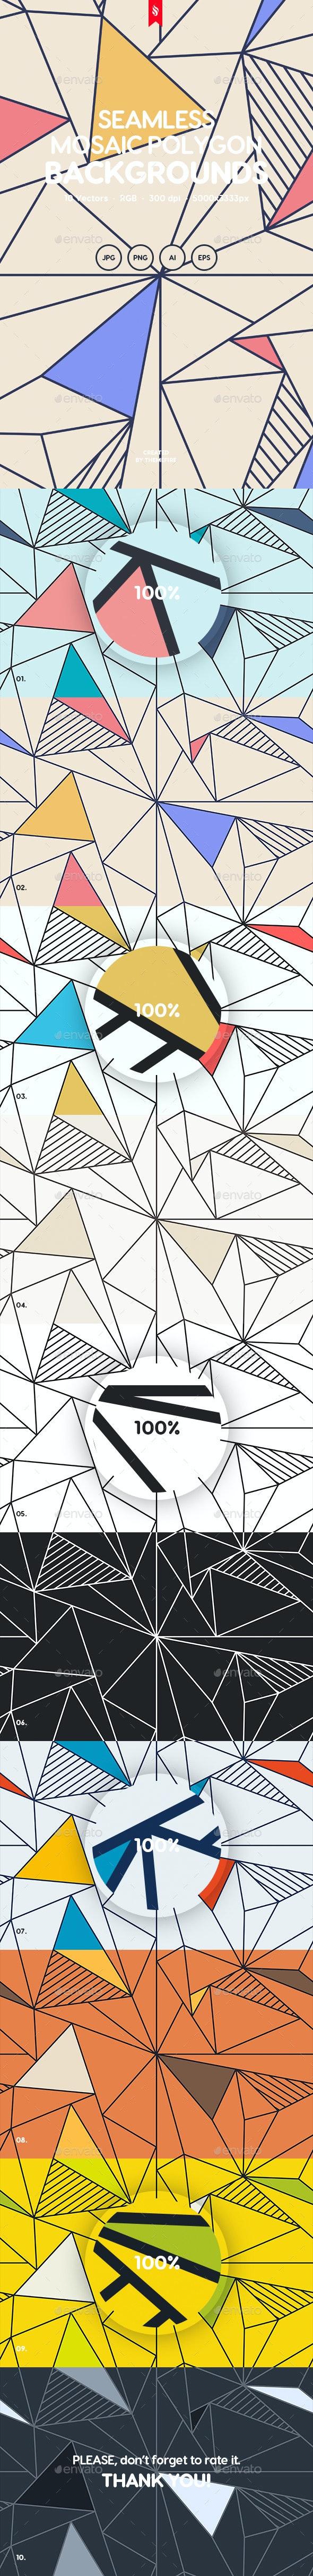 Colorful Mosaic Polygon Seamless Patterns - Patterns Backgrounds